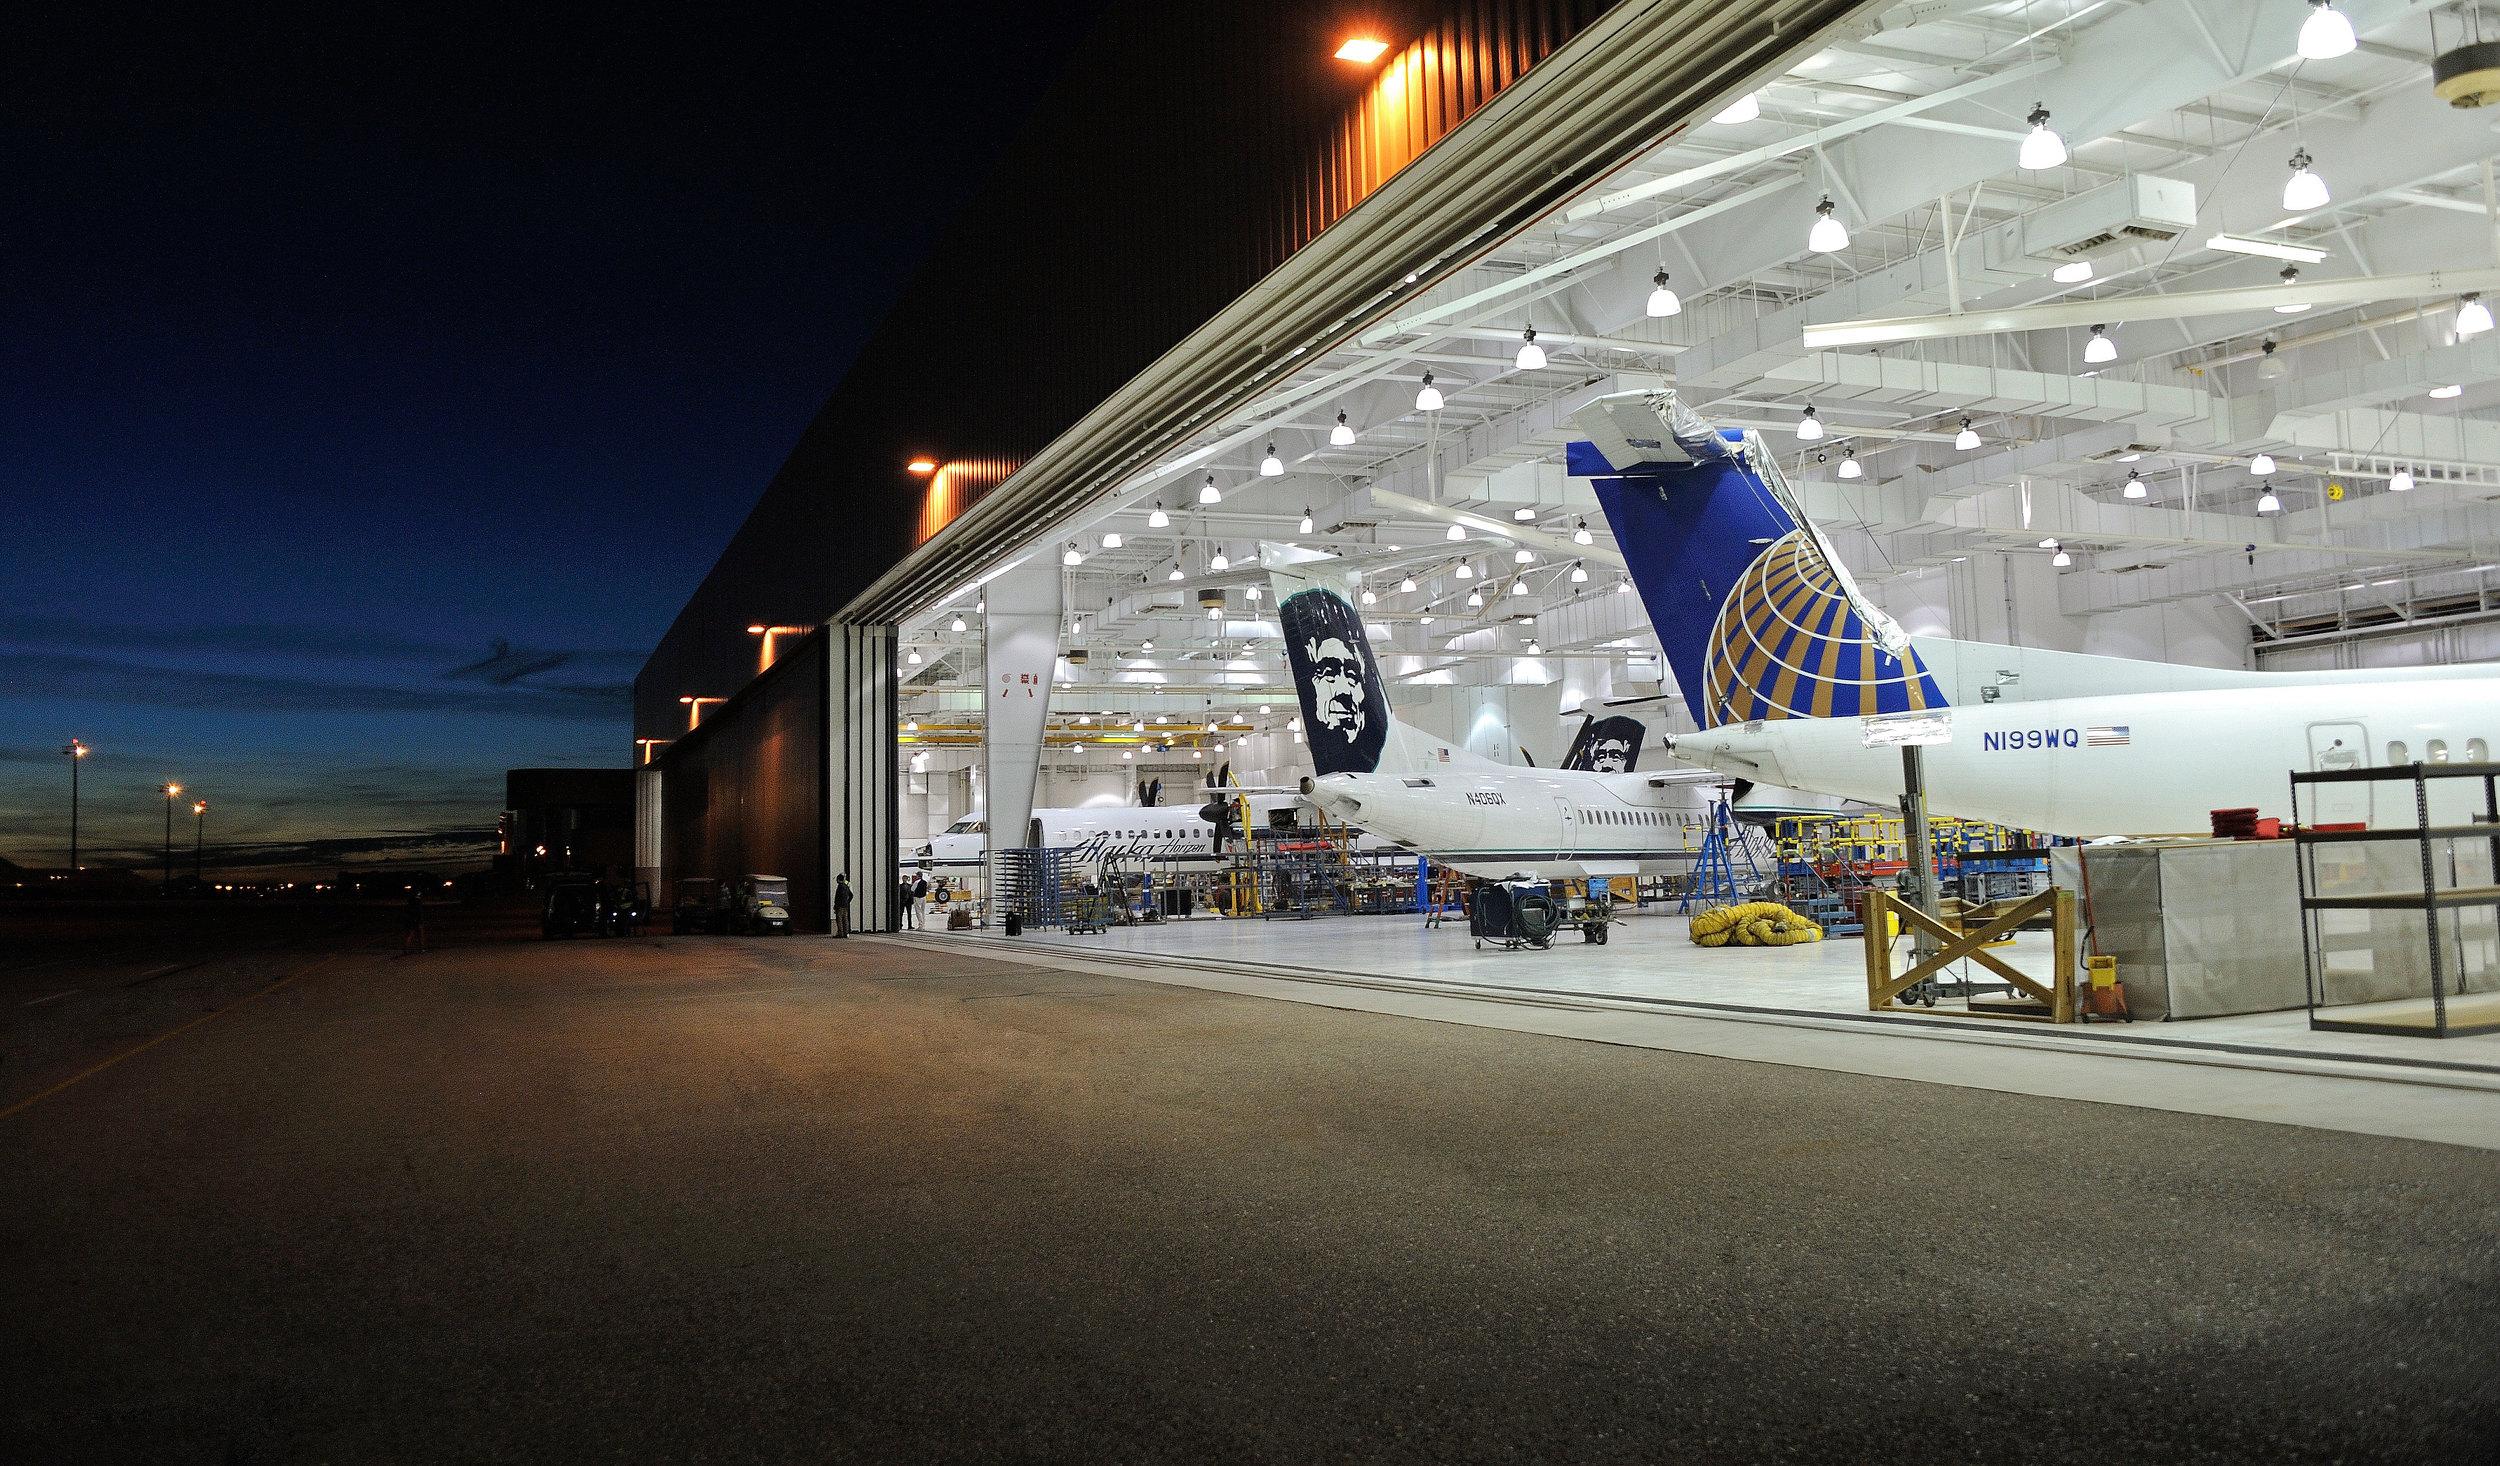 _BHW9982-Tucson-Service-Hangar-Smart-Web-II.jpg